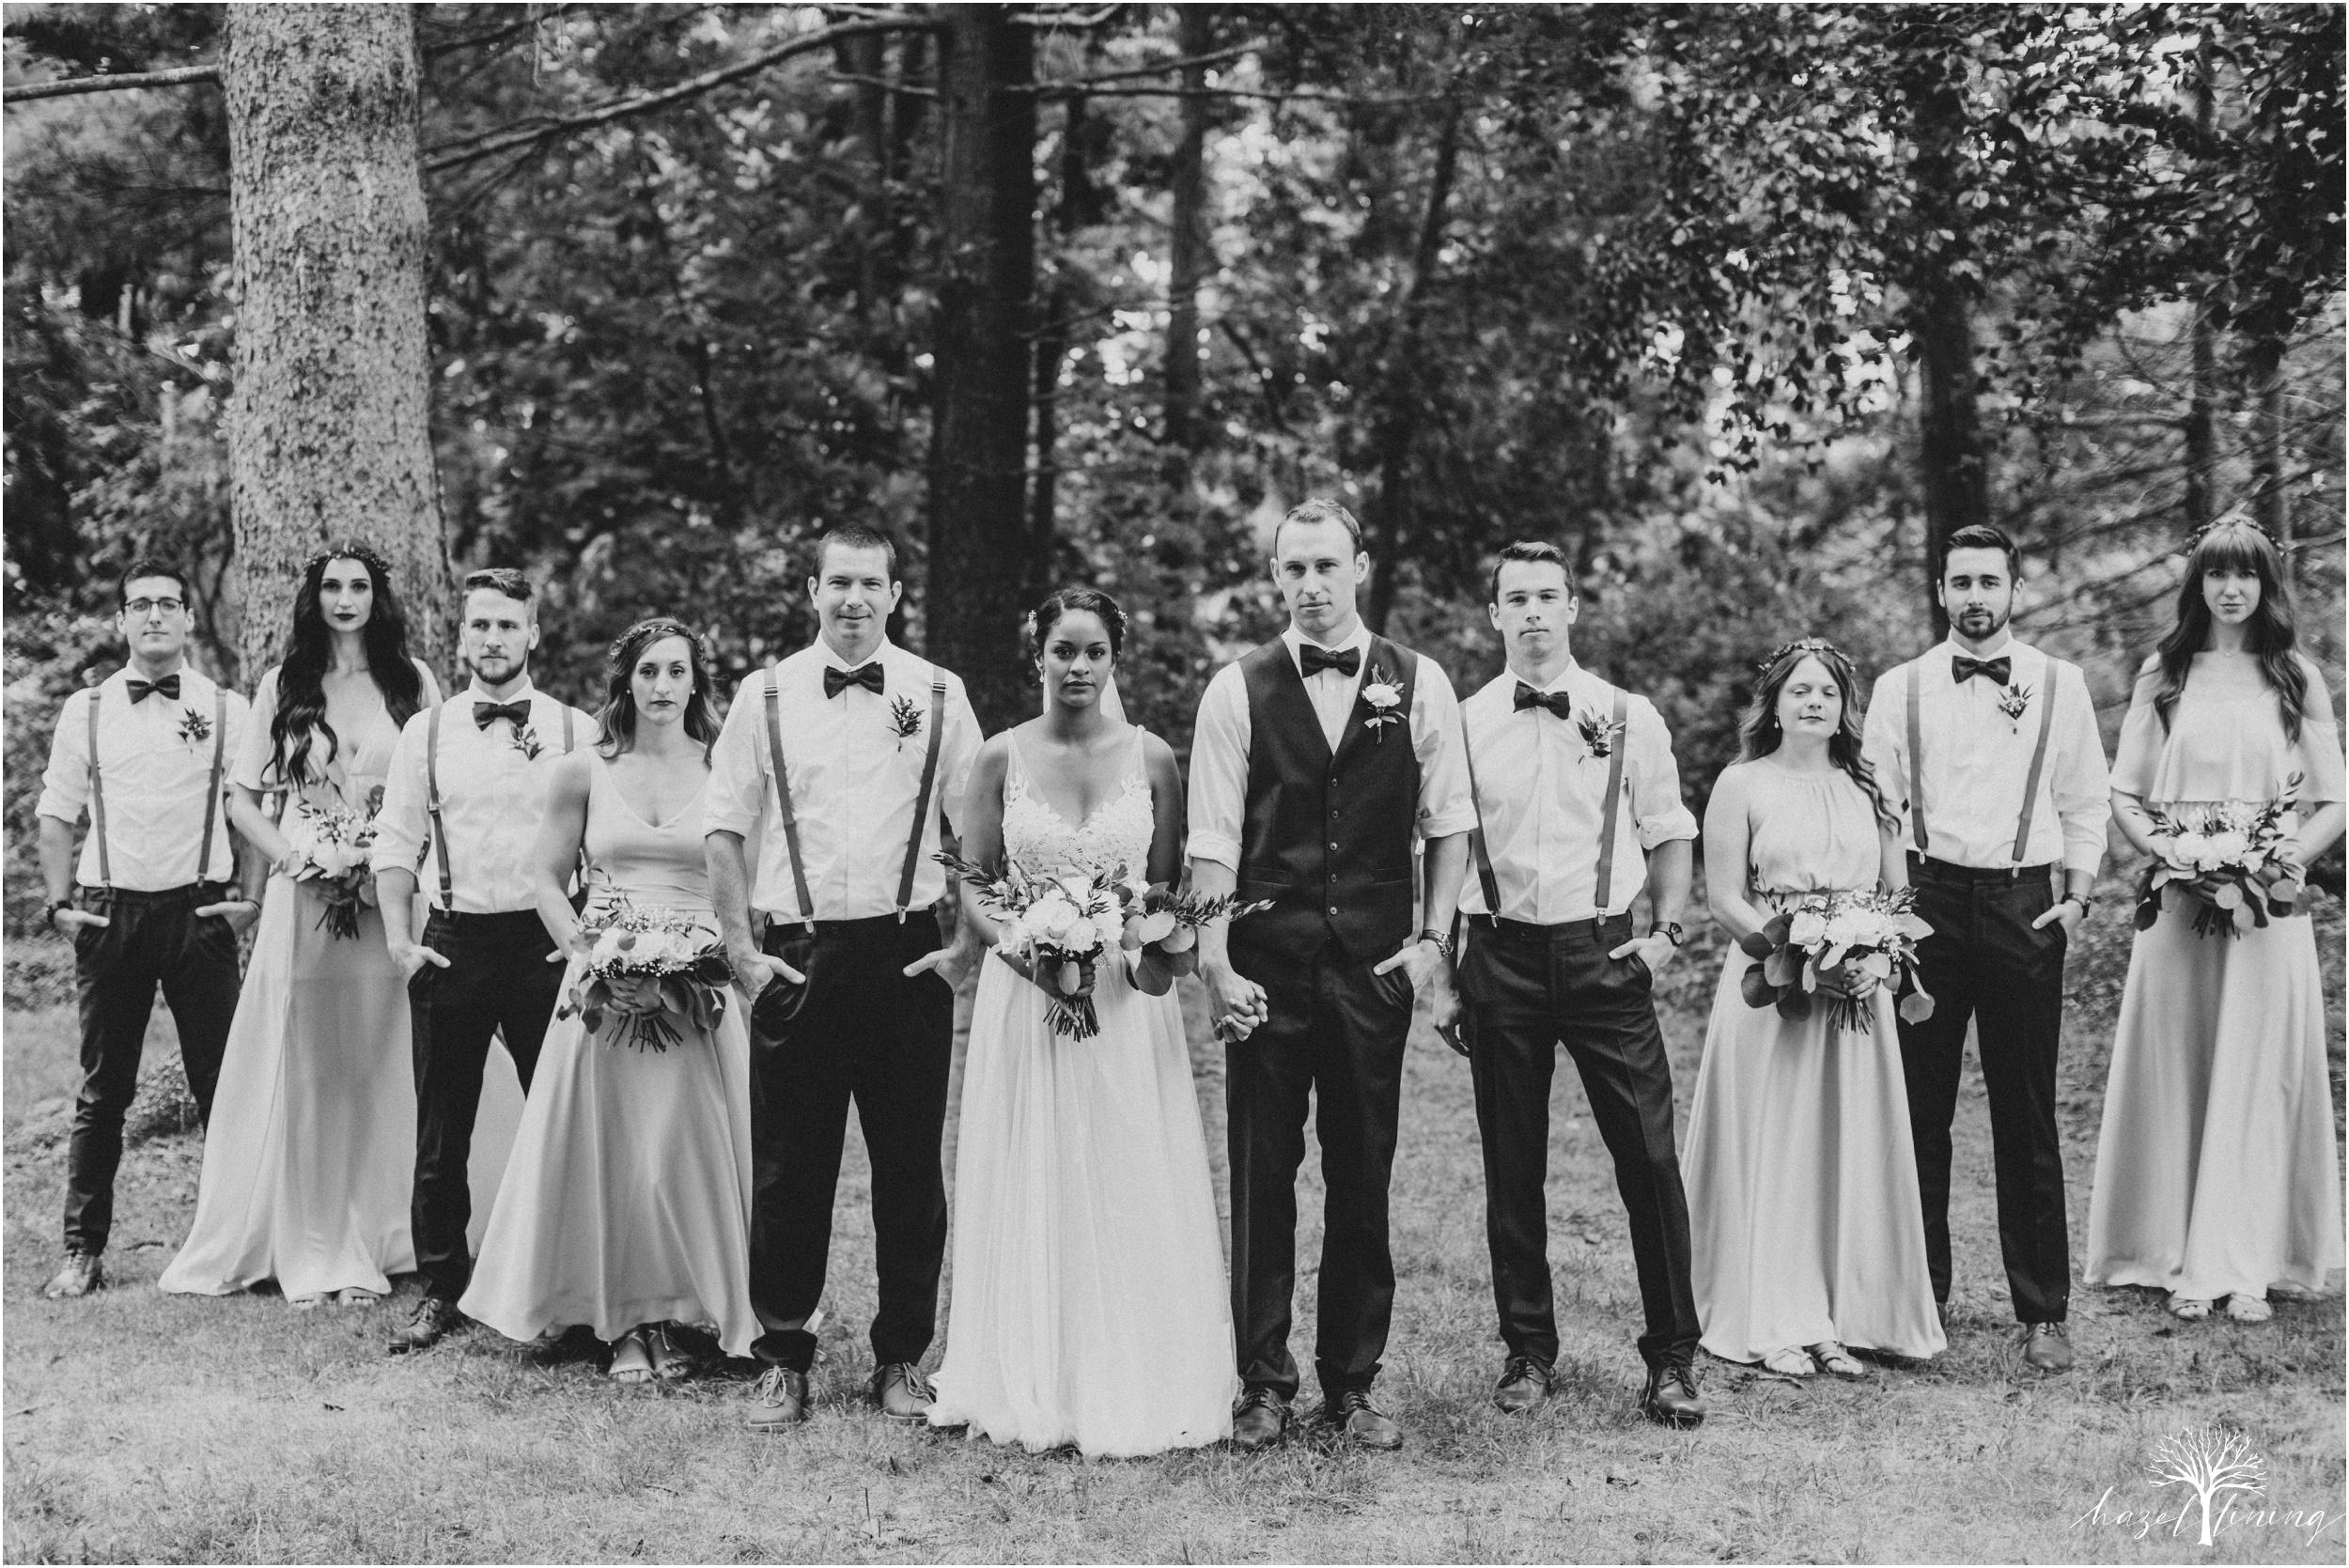 mariah-kreyling-samuel-sherratt-sherrattwiththeworld-peirce-farm-at-witch-hill-boston-massachusetts-wedding-photography-hazel-lining-travel-wedding-elopement-photography_0109.jpg